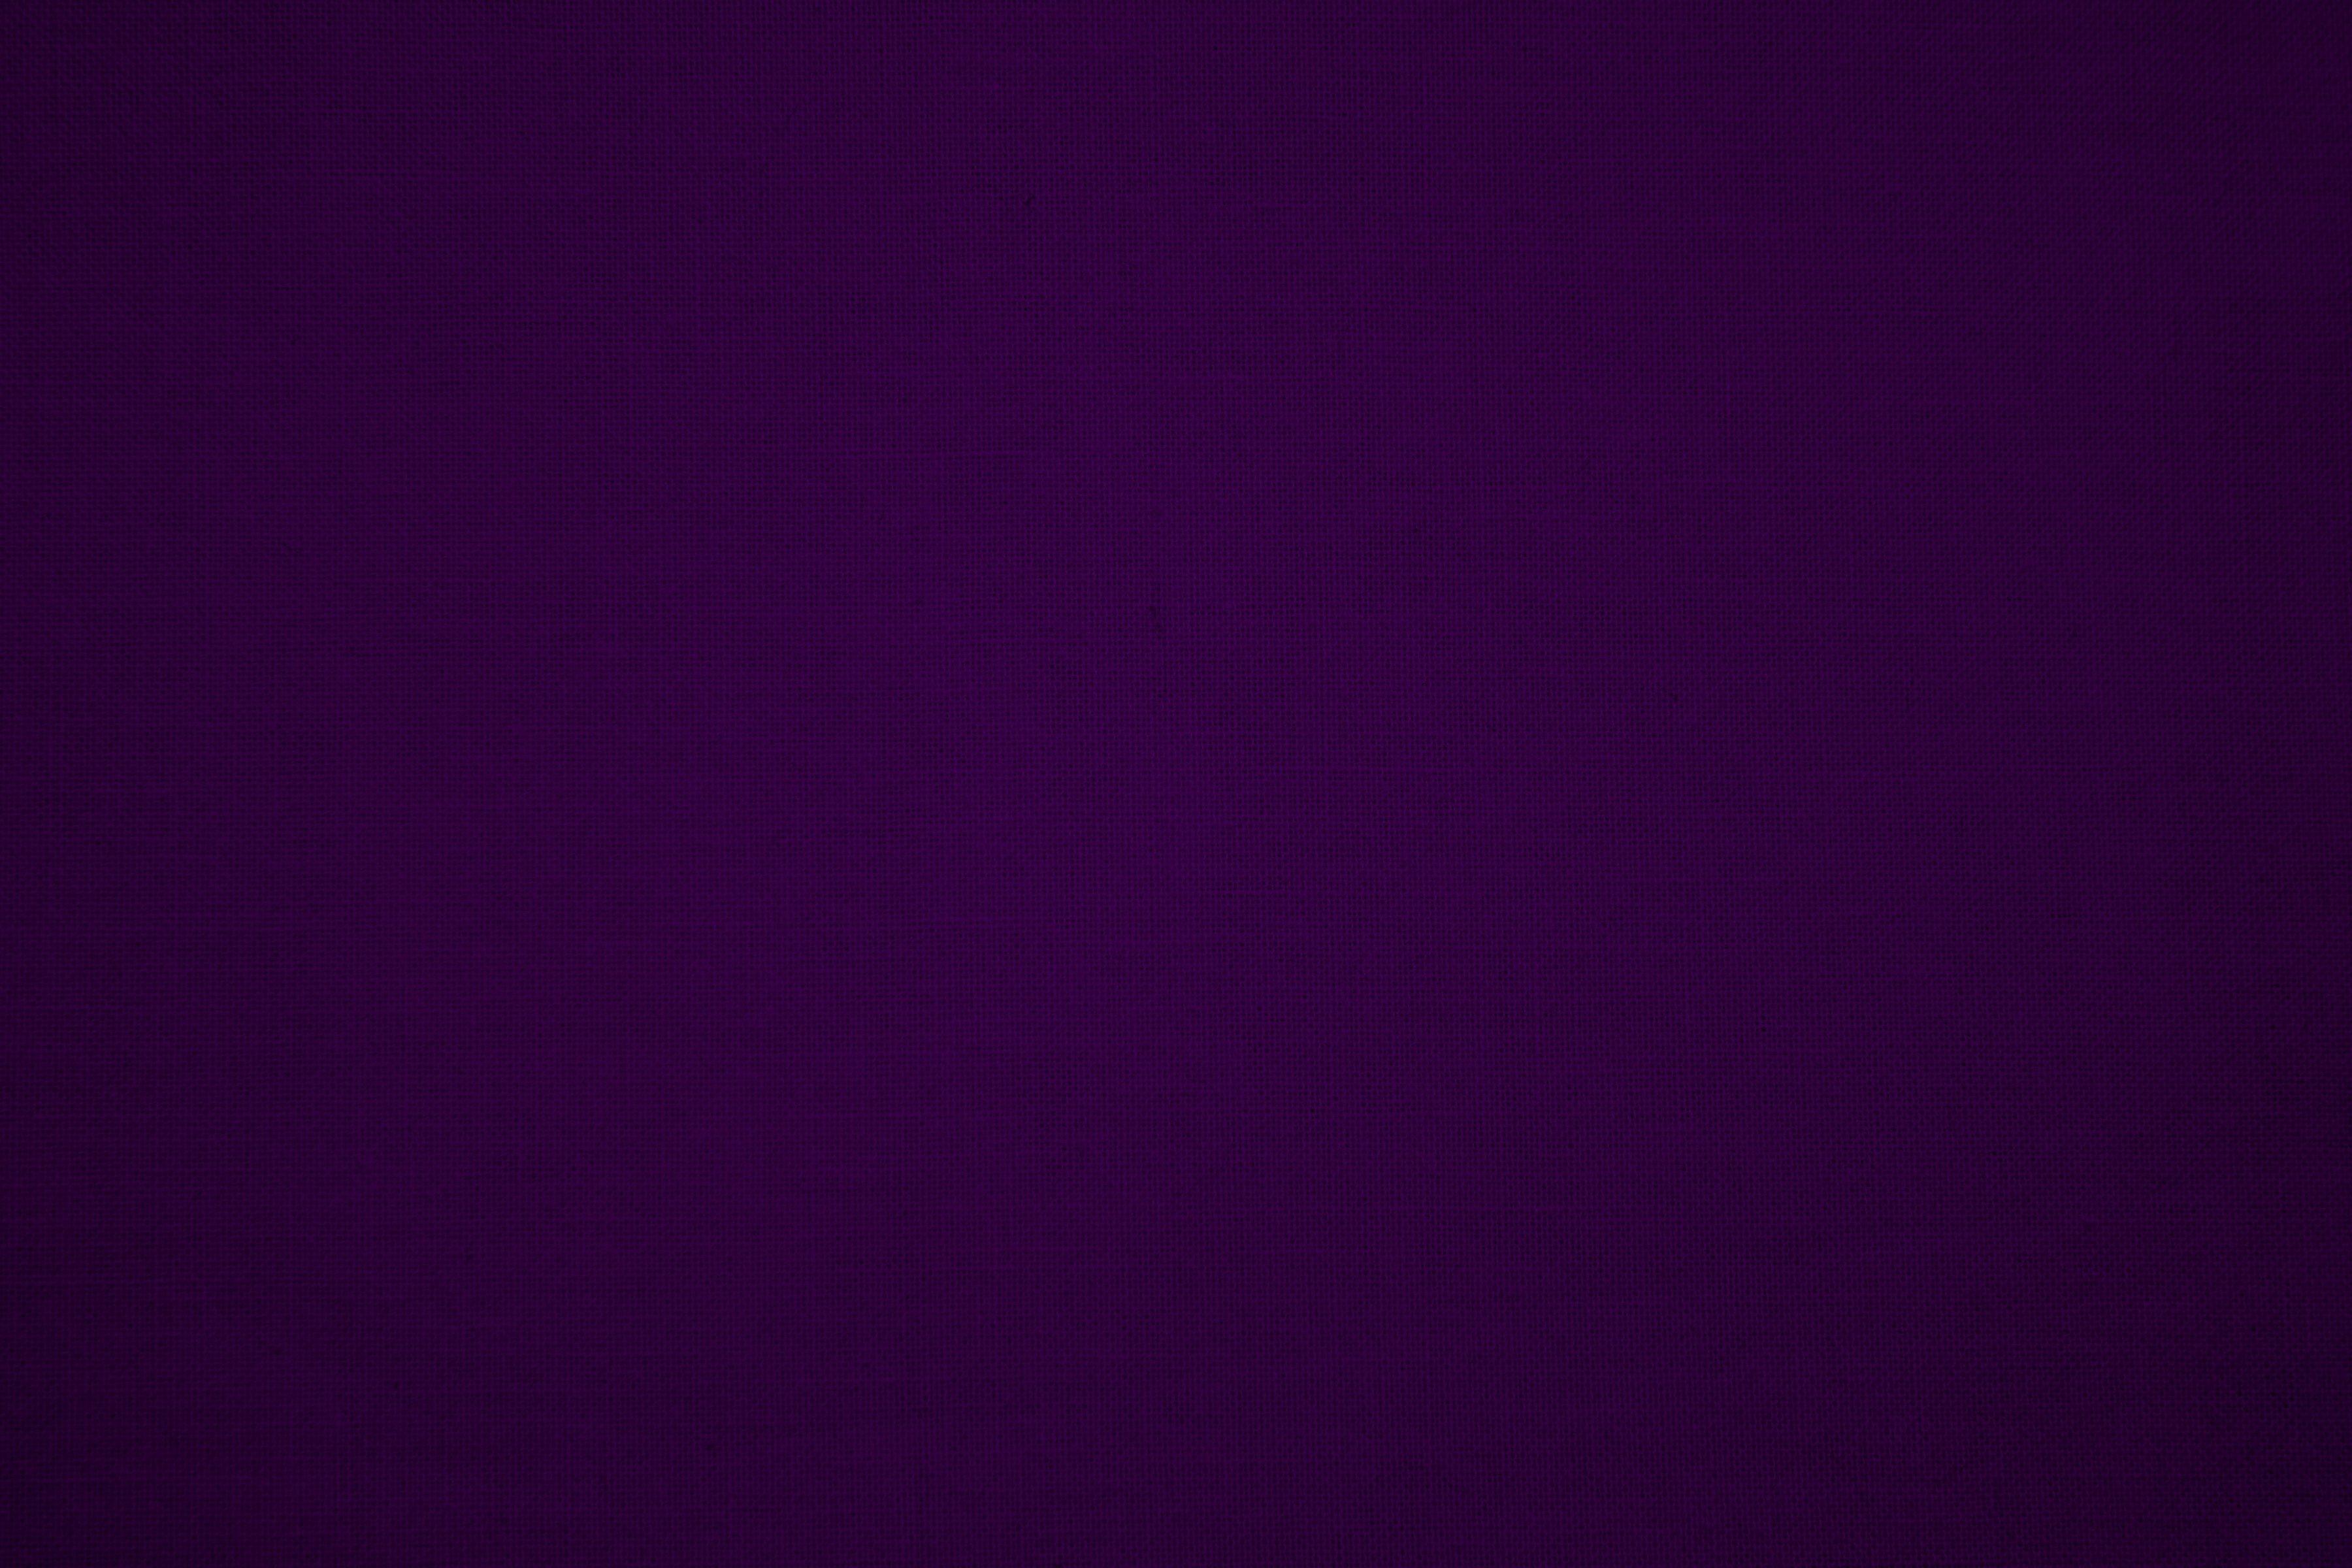 Deep Purple Canvas Fabric Texture Picture Photograph Photos 3600x2400